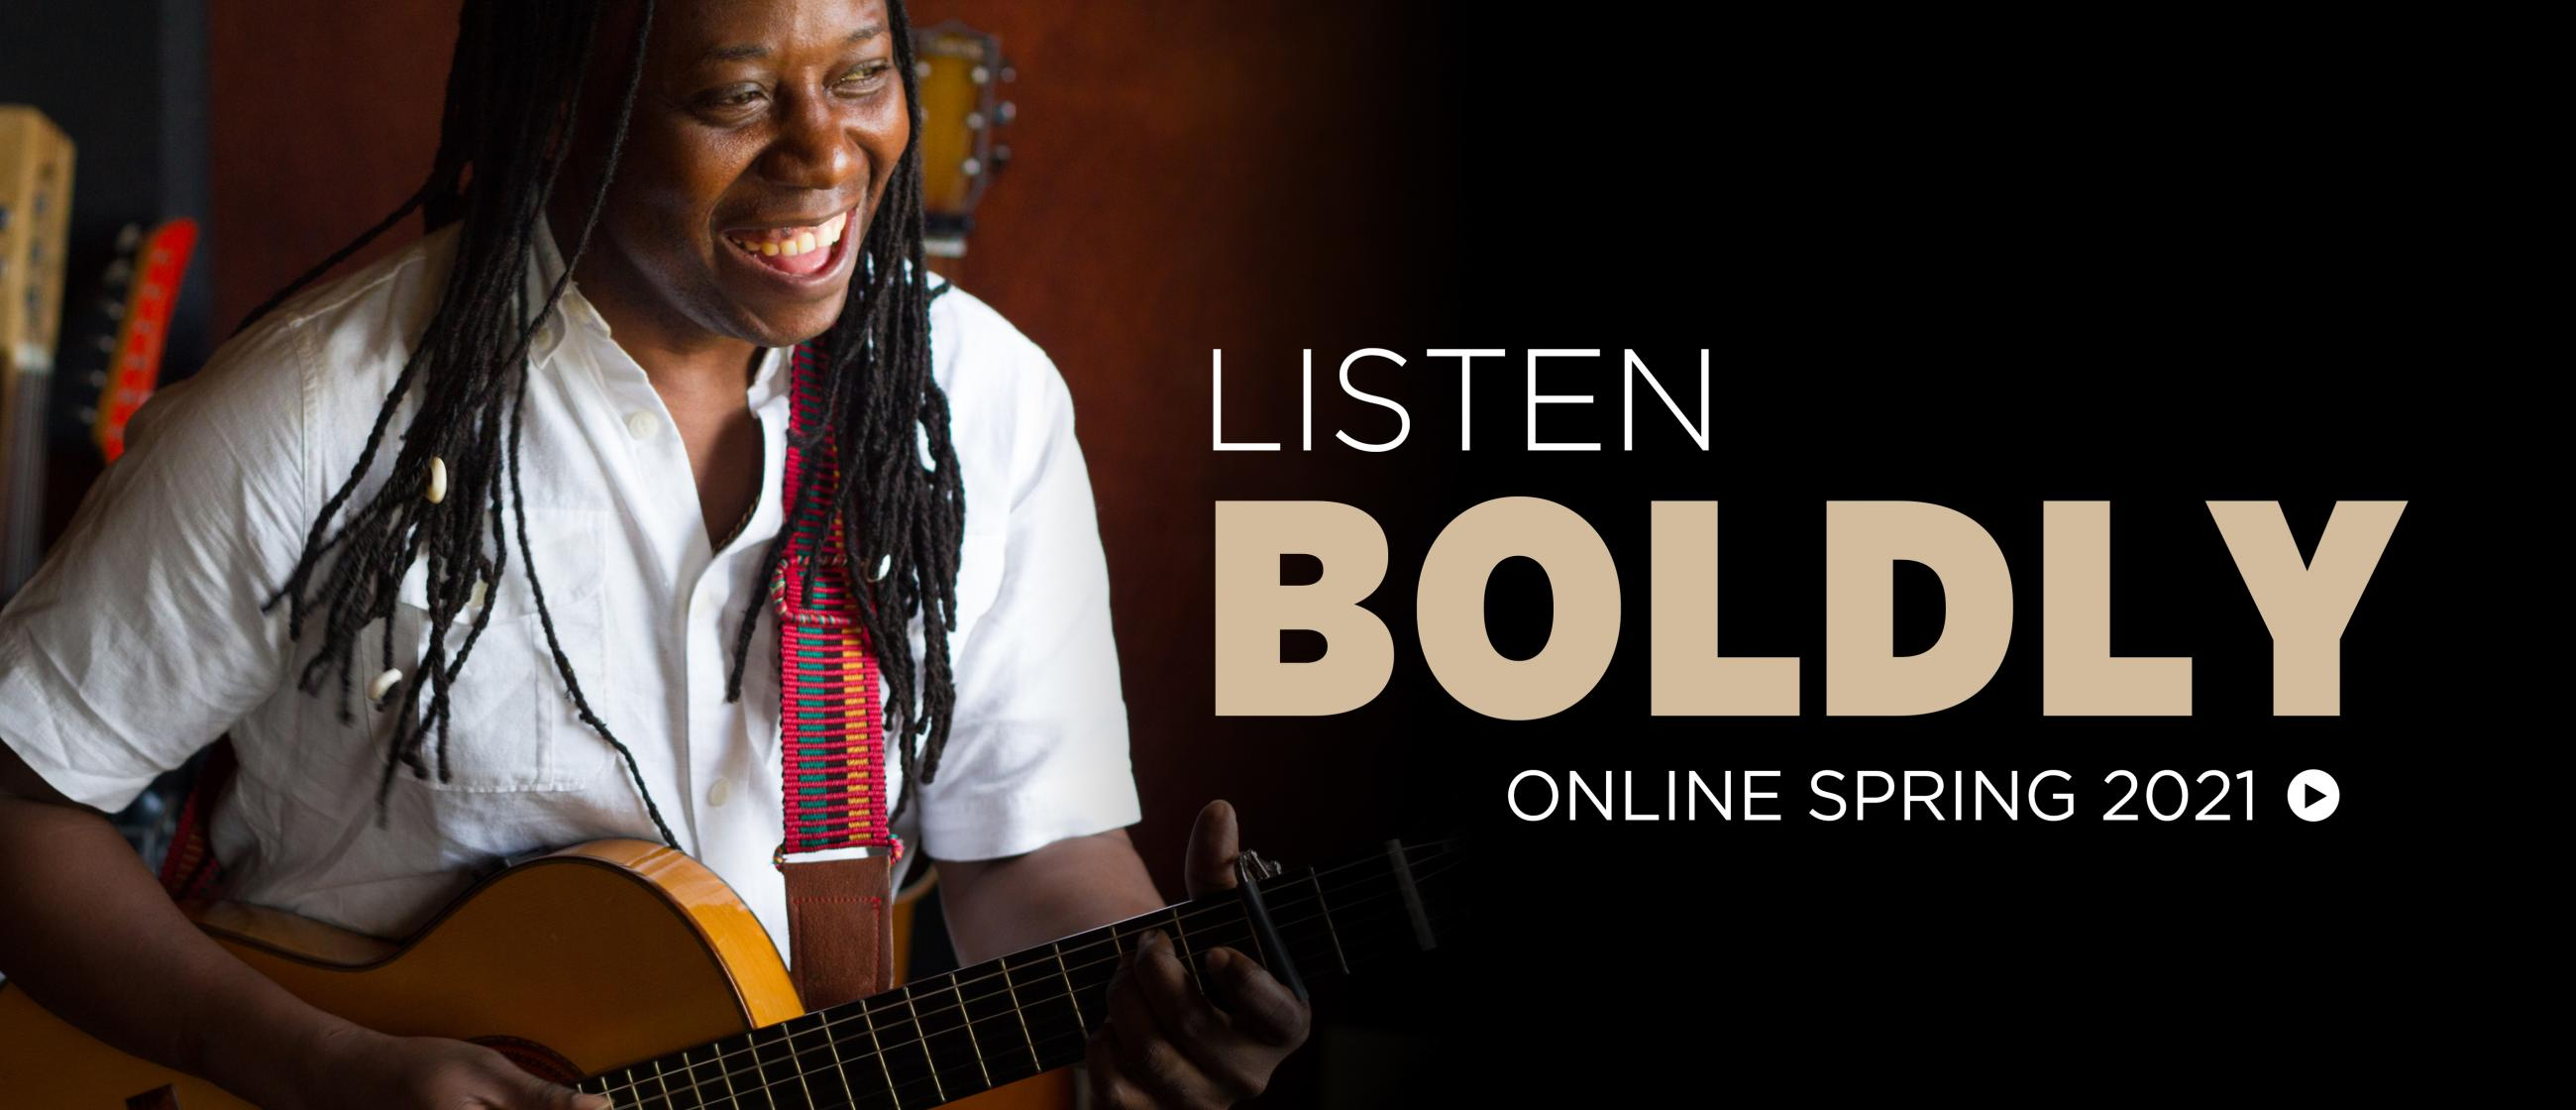 Photo of Aurelio Martínez playing guitar. Text reads Listen Boldly, Online Spring 2021